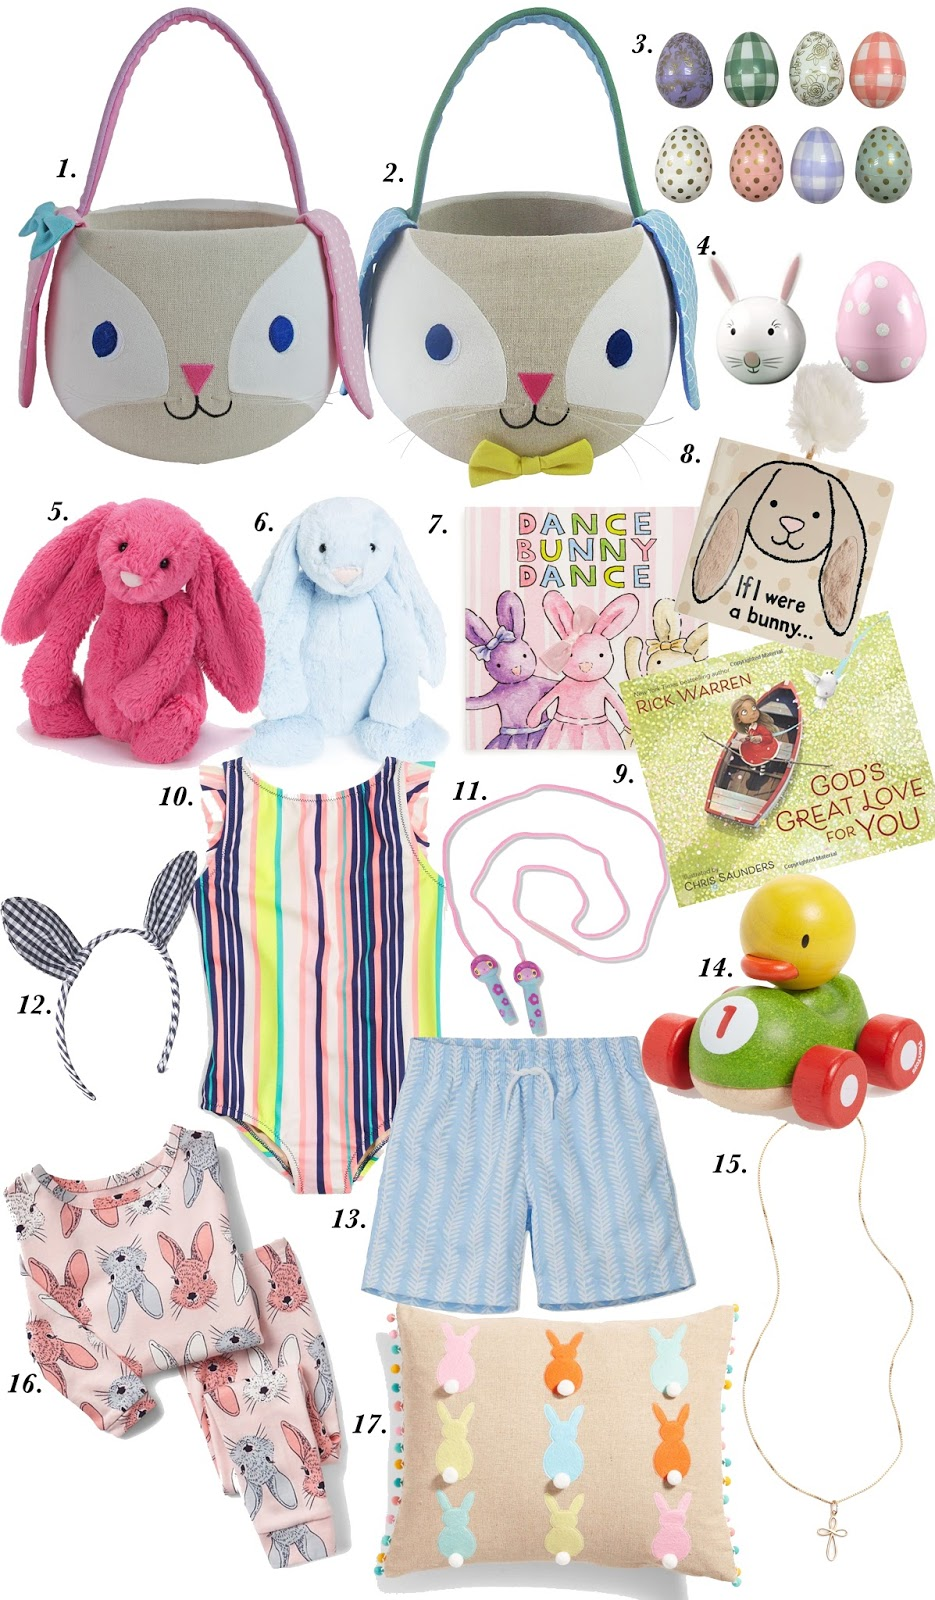 Easter Basket Ideas for Kids - Something Delightful Blog